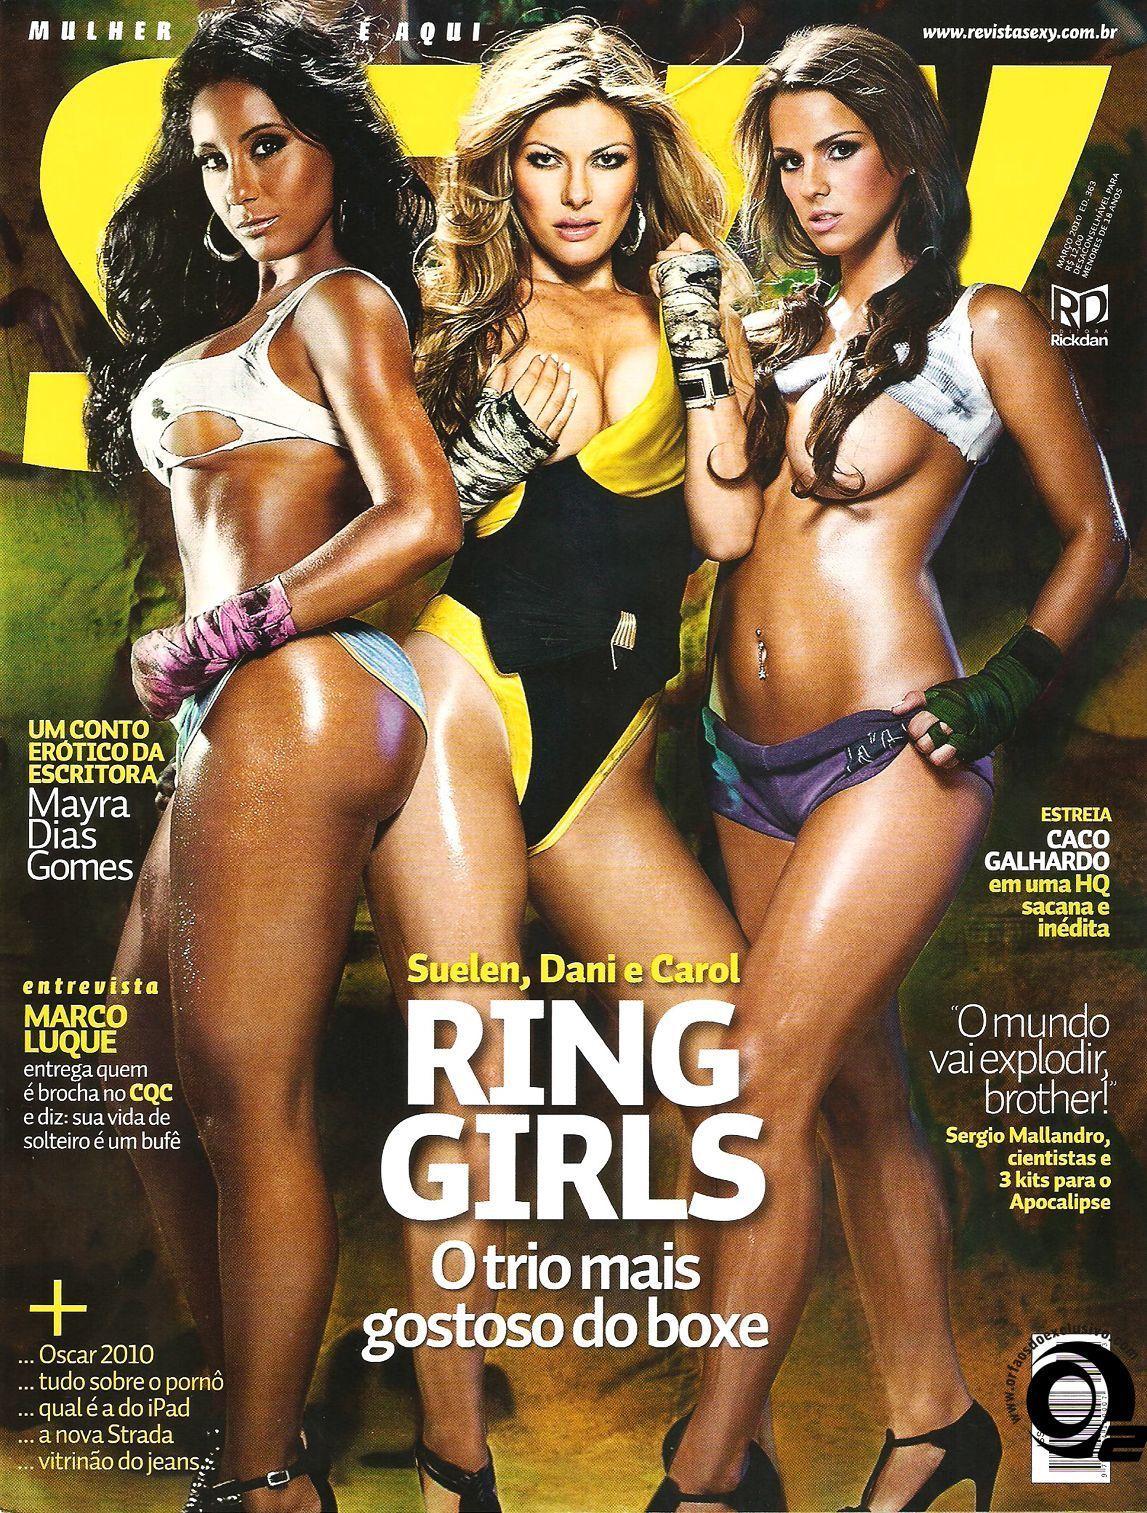 ... fotos das Ring Girls, Suelen, Dani e Carol, capa da Sexy de março de